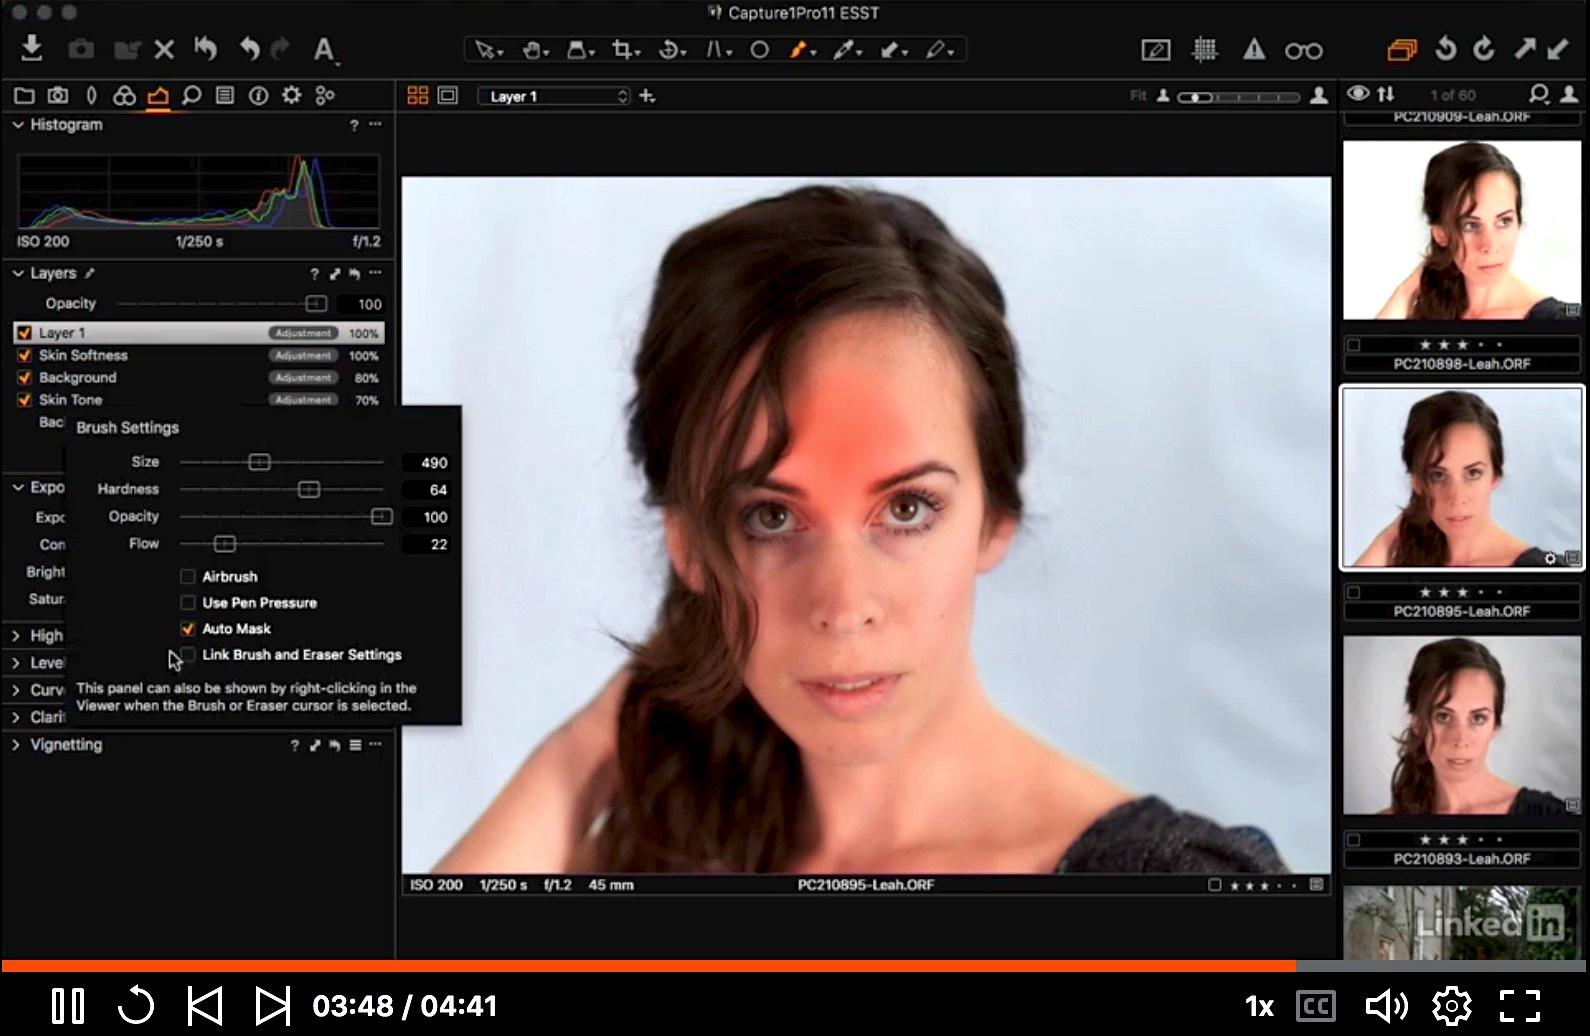 http://thedigitalstory.com/2018/03/09/layers-capture-one-11-web.jpg